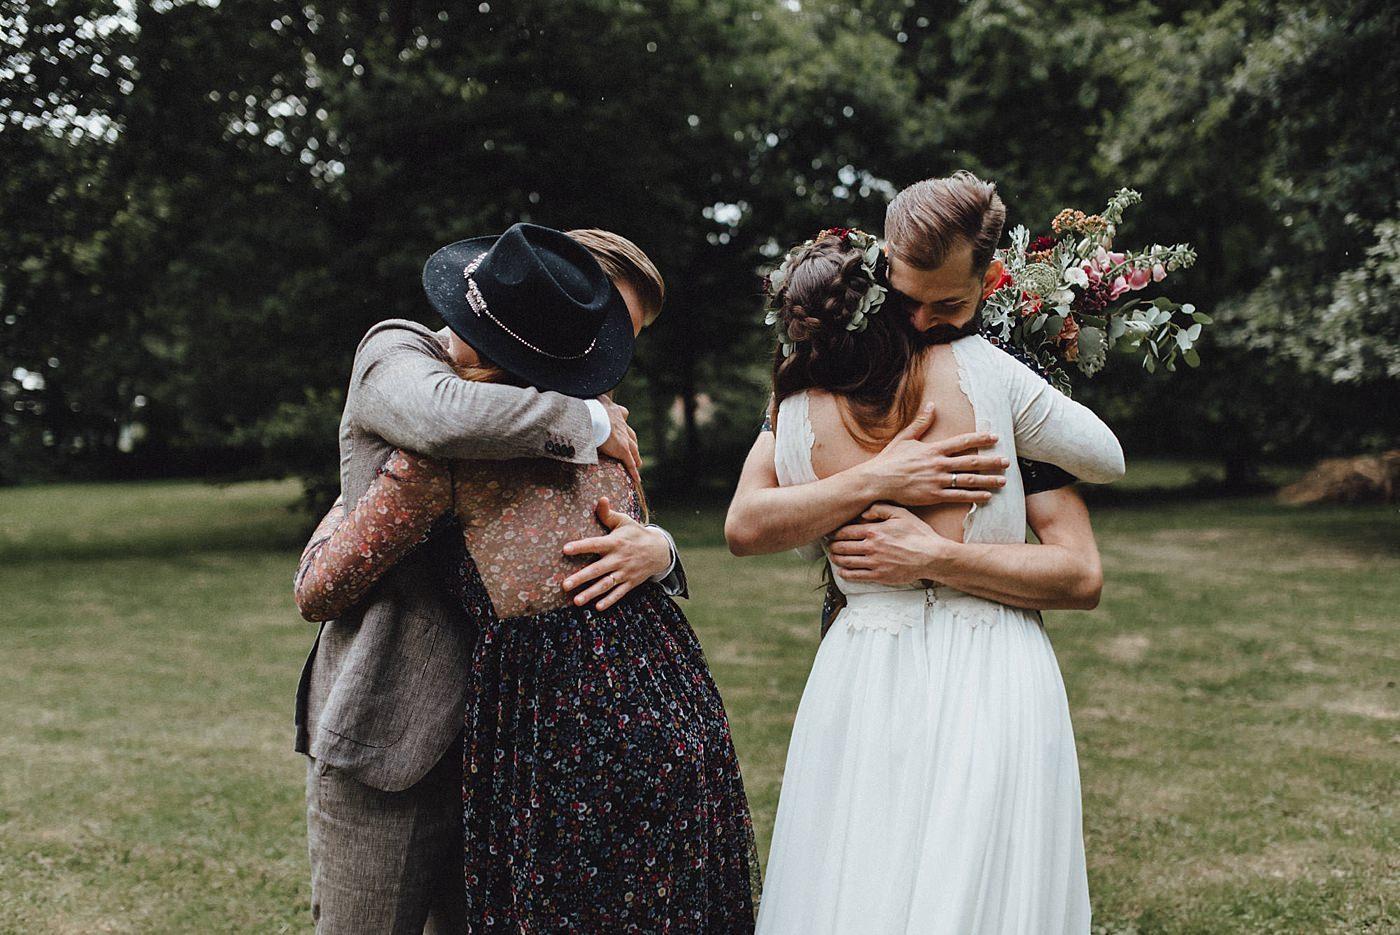 urban-elopement-wedding-128